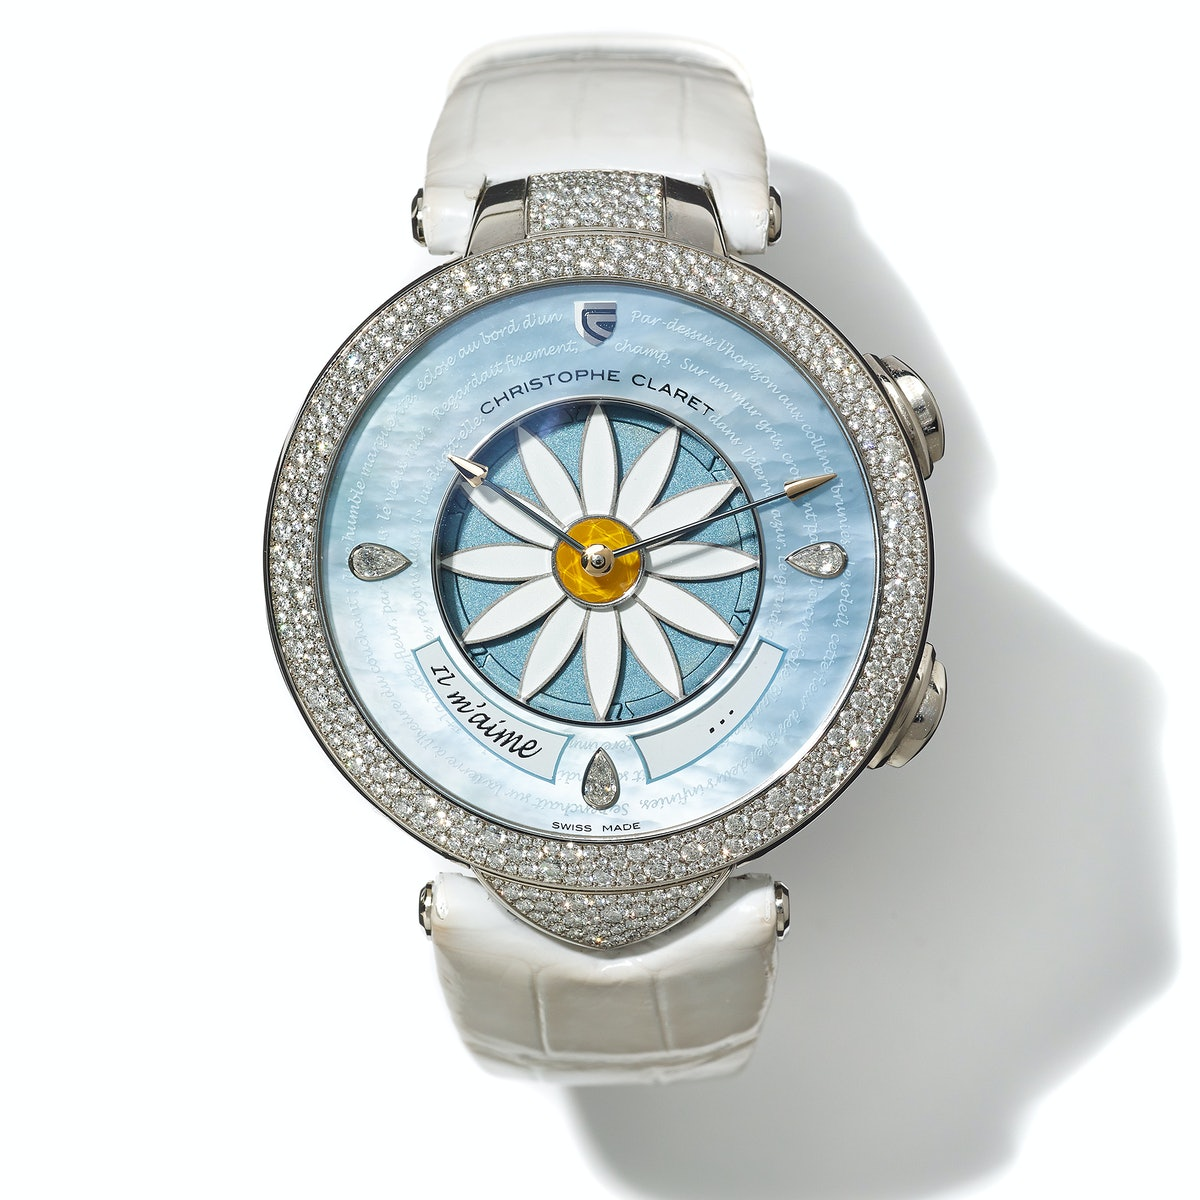 Christophe Claret gold and diamond watch